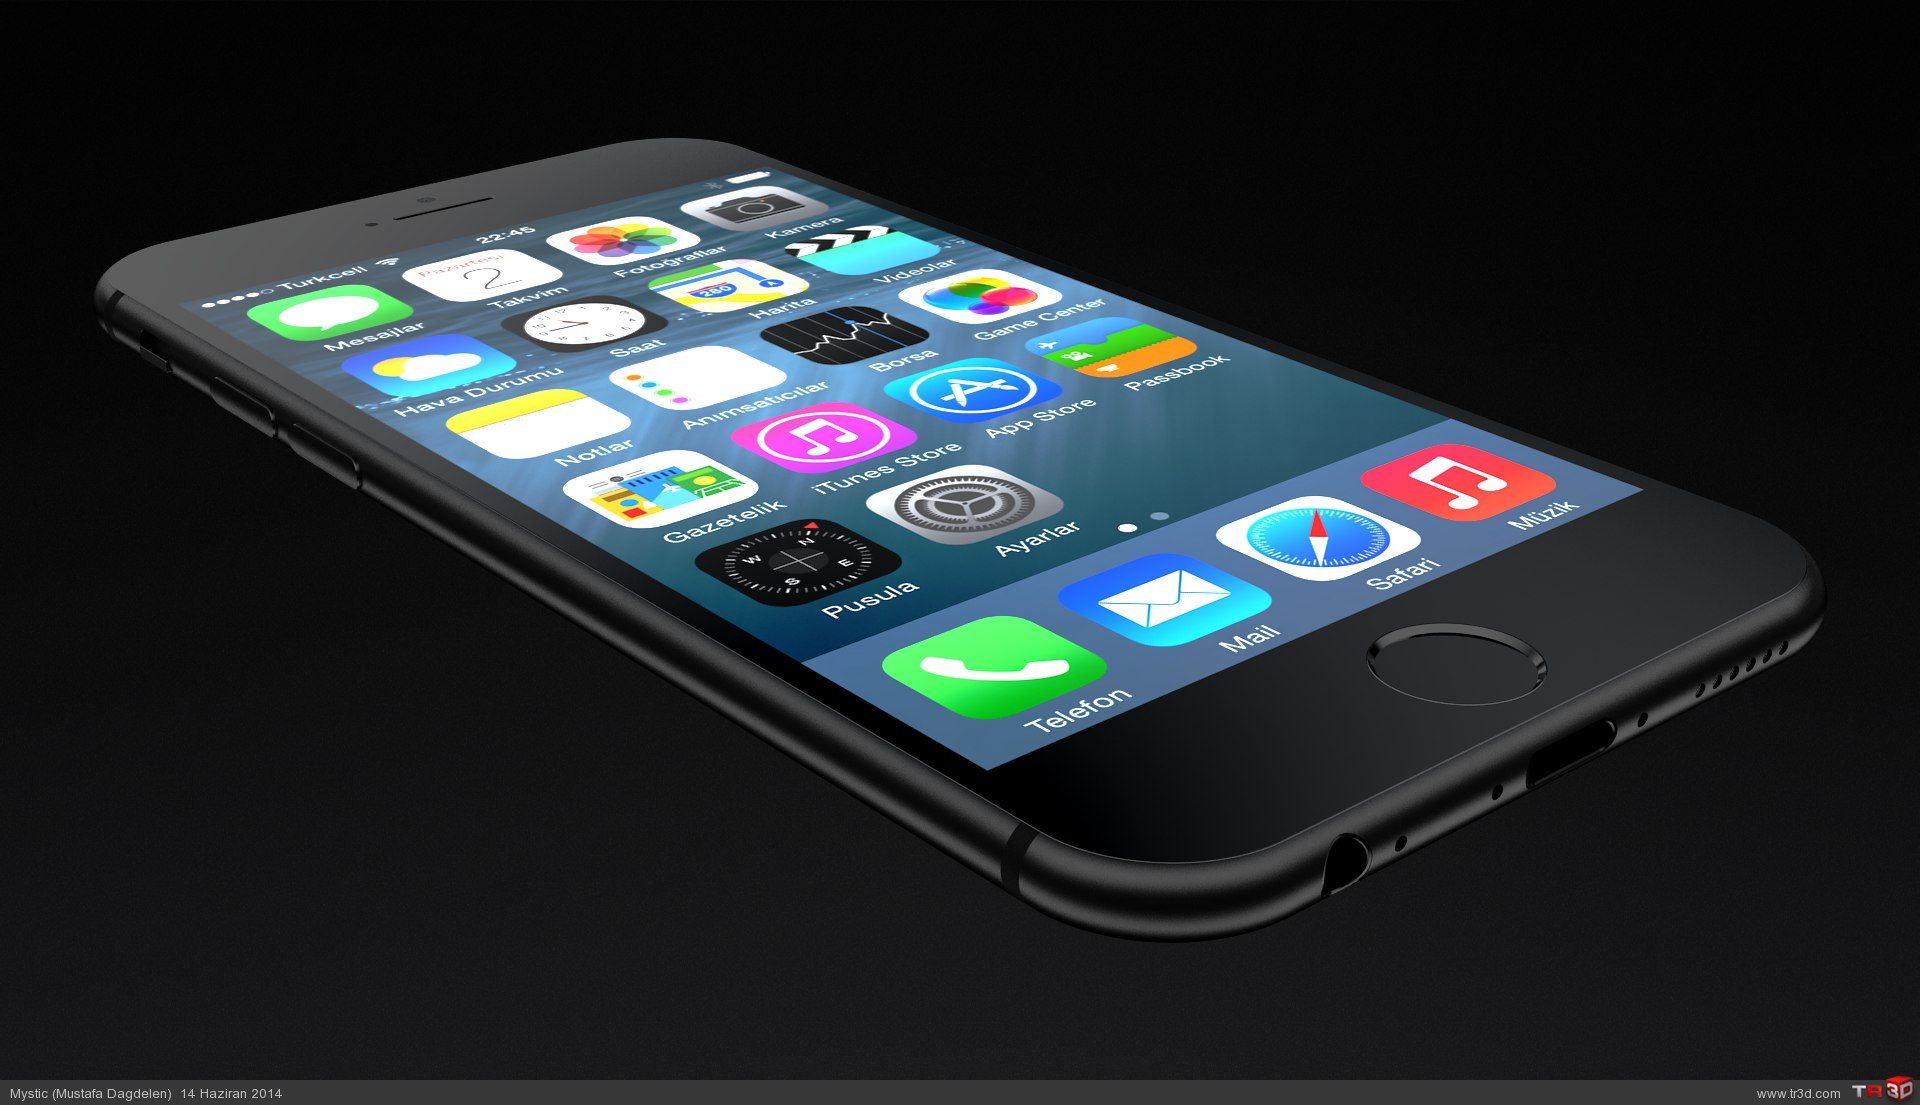 Apple iPhone 6 Finally